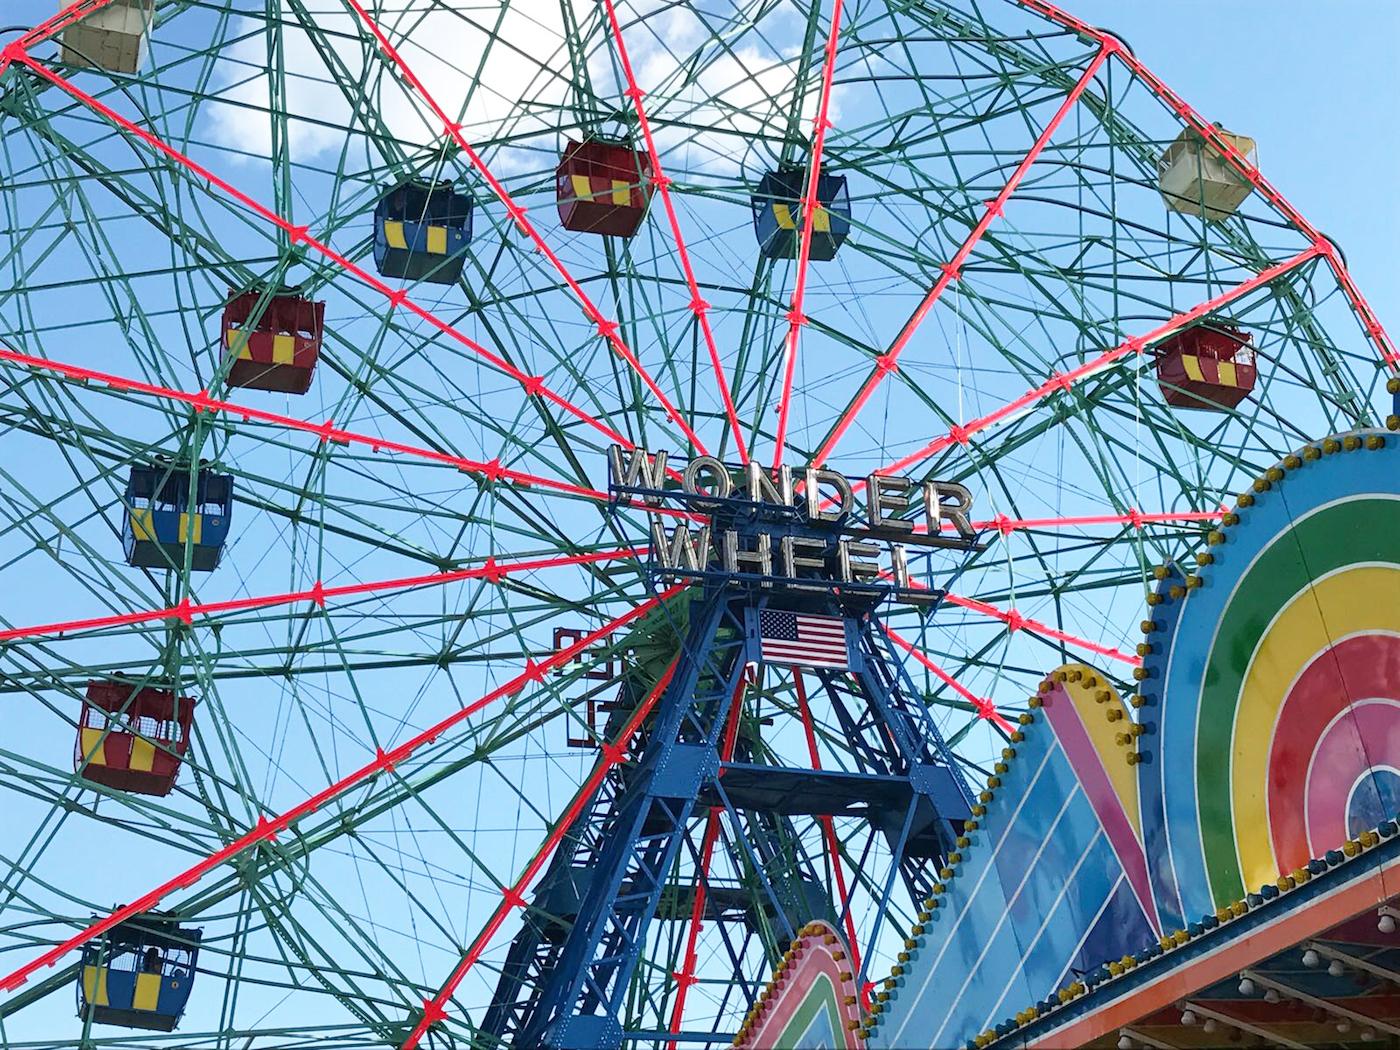 Coney Island New York wonder wheel